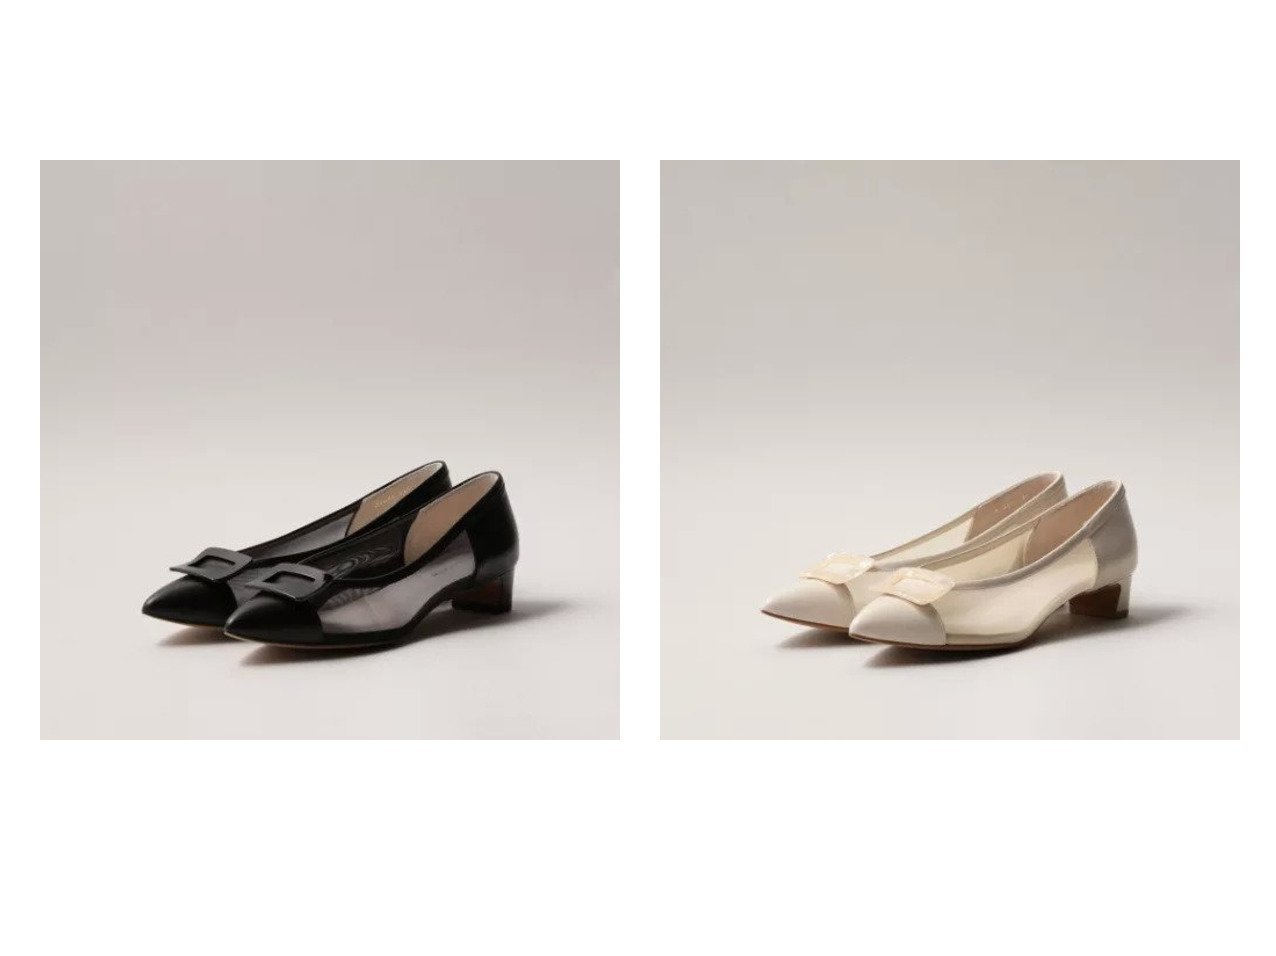 【Odette e Odile/オデット エ オディール】のOFD フレームチュール パンプス30 【シューズ・靴】おすすめ!人気、トレンド・レディースファッションの通販 おすすめで人気の流行・トレンド、ファッションの通販商品 インテリア・家具・メンズファッション・キッズファッション・レディースファッション・服の通販 founy(ファニー) https://founy.com/ ファッション Fashion レディースファッション WOMEN シューズ チュール フレーム おすすめ Recommend |ID:crp329100000045172